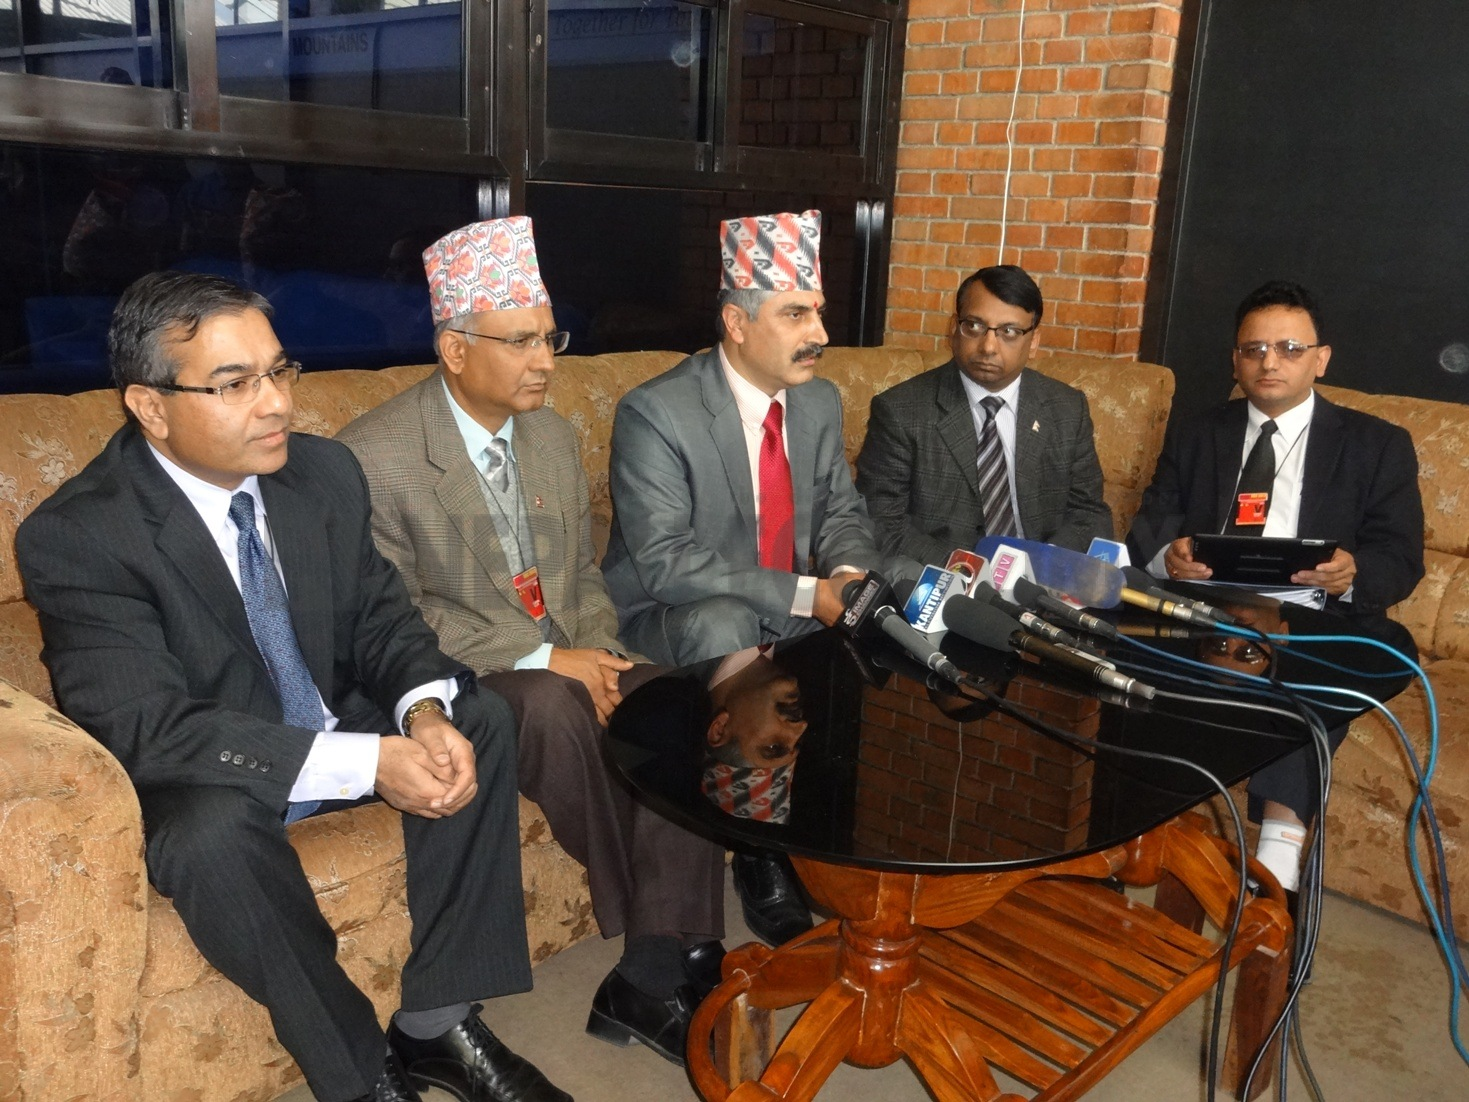 Nepal to raise LDCs' issues seriously: Koirala